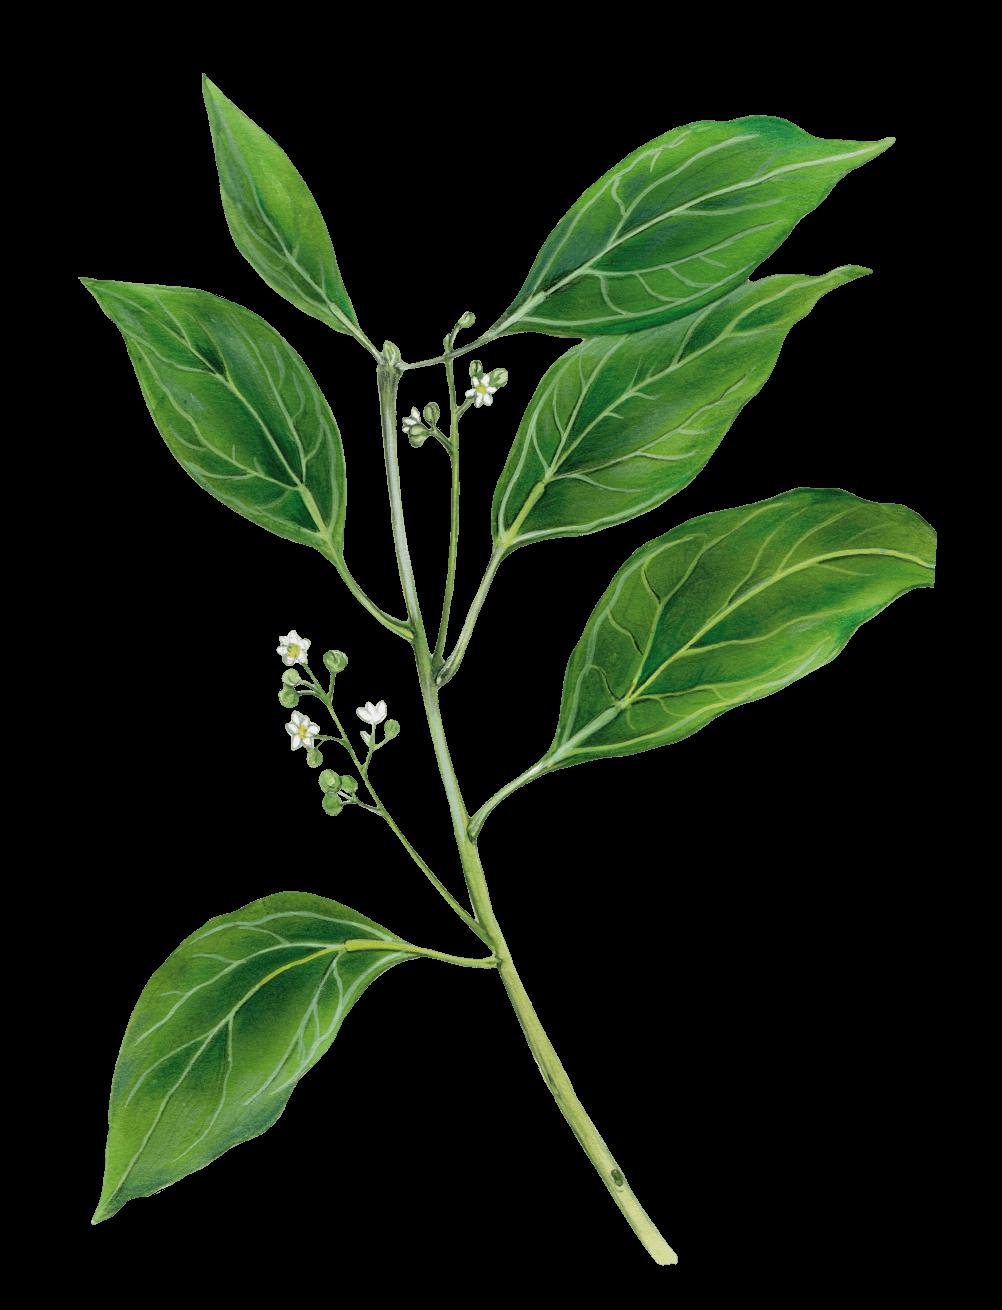 Decorative plant image